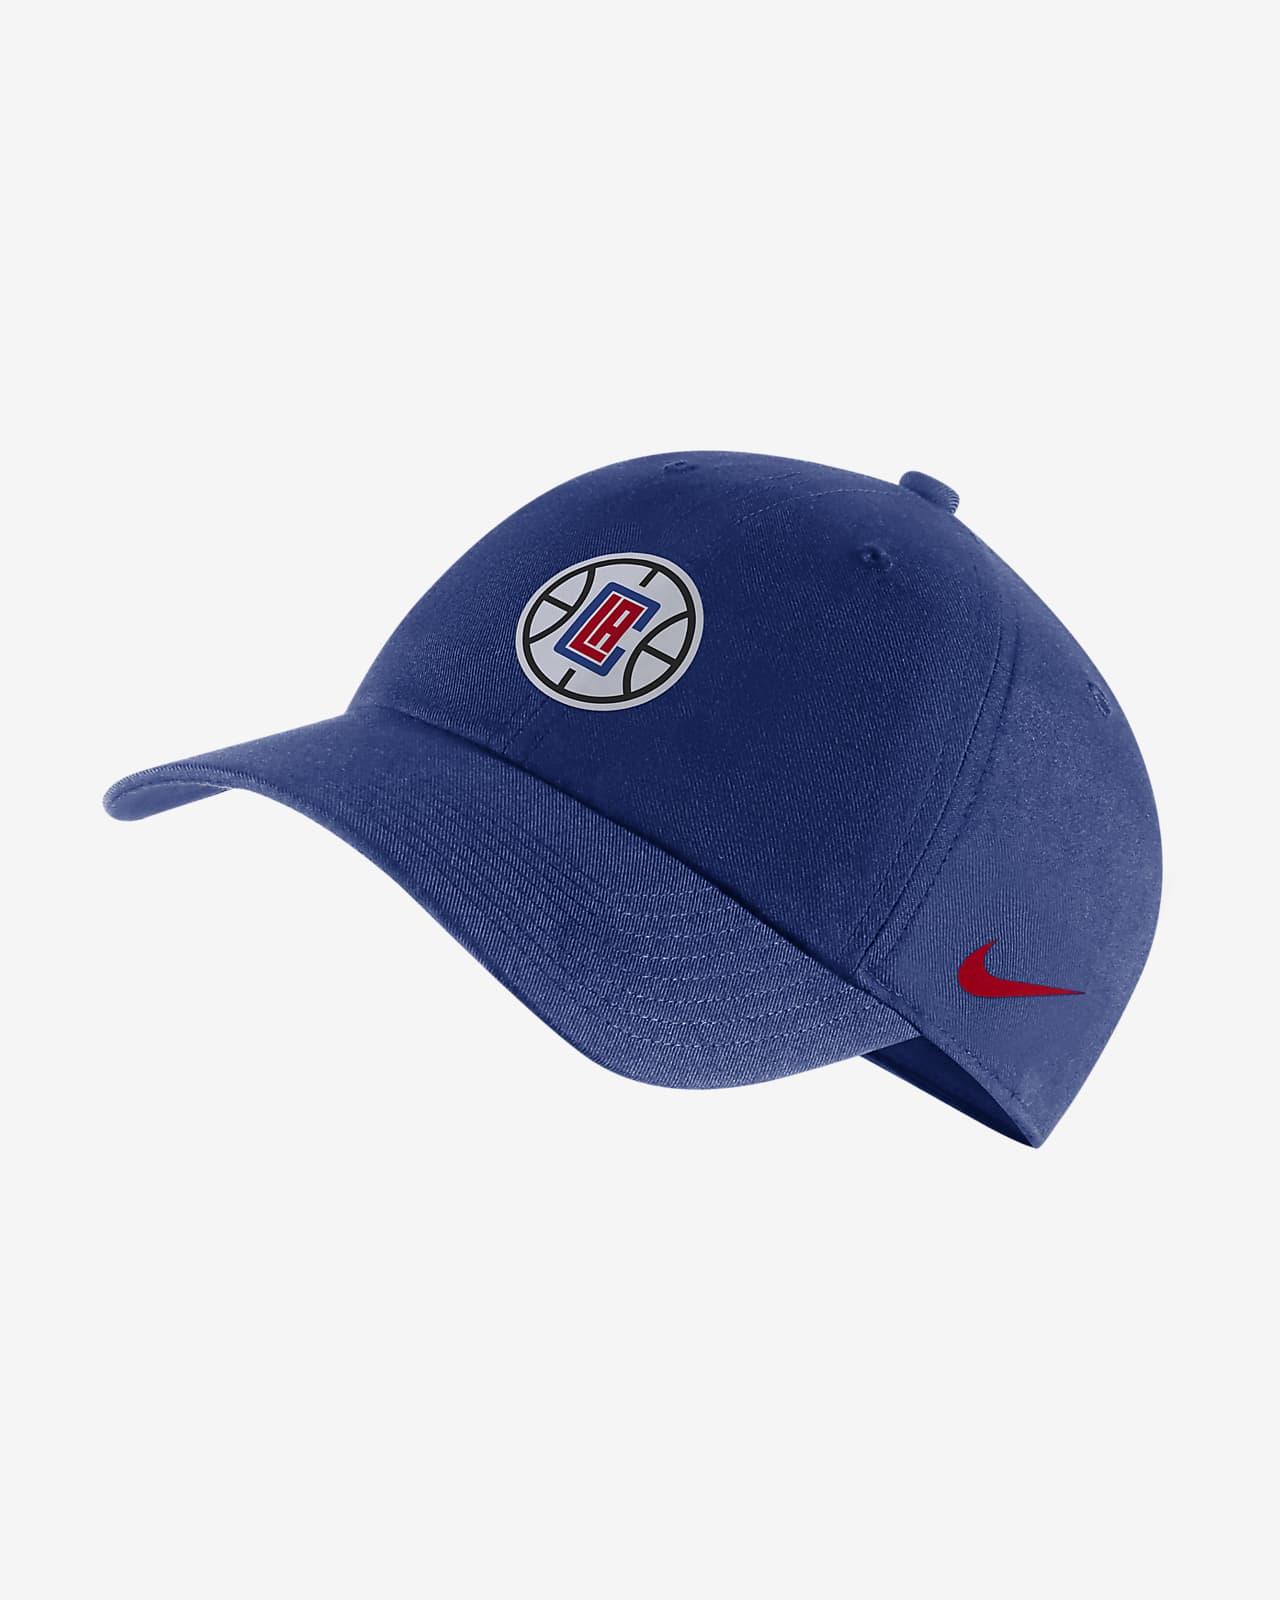 Clippers Heritage86 Nike Dri-FIT NBA Cap